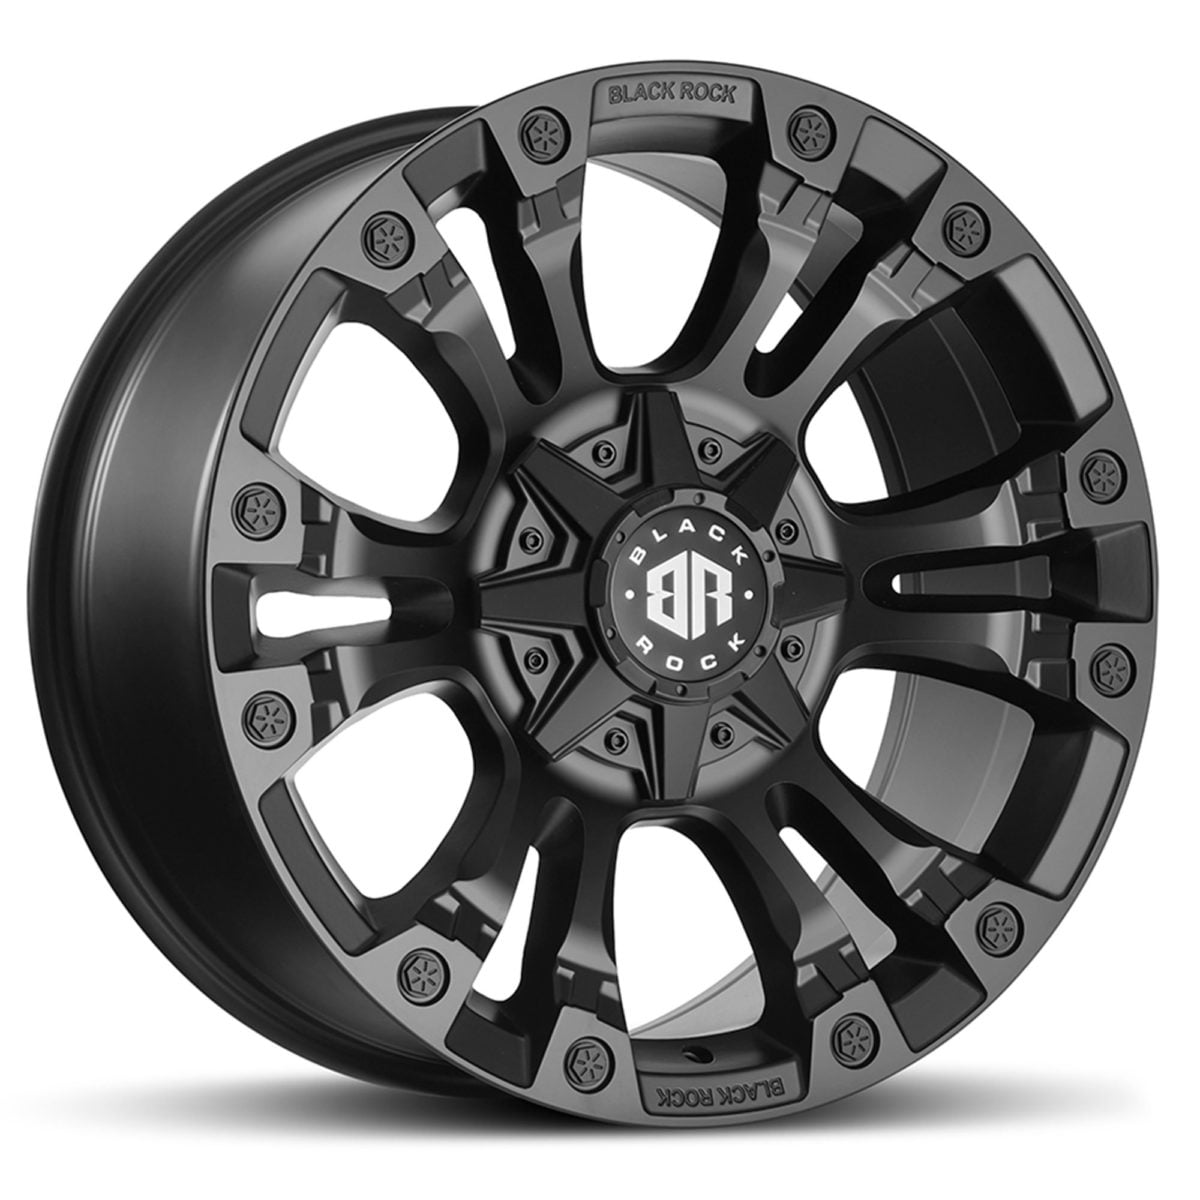 Black Rock Forcer Satin Black Wheel 4x4 Rim for 6 stud trucks